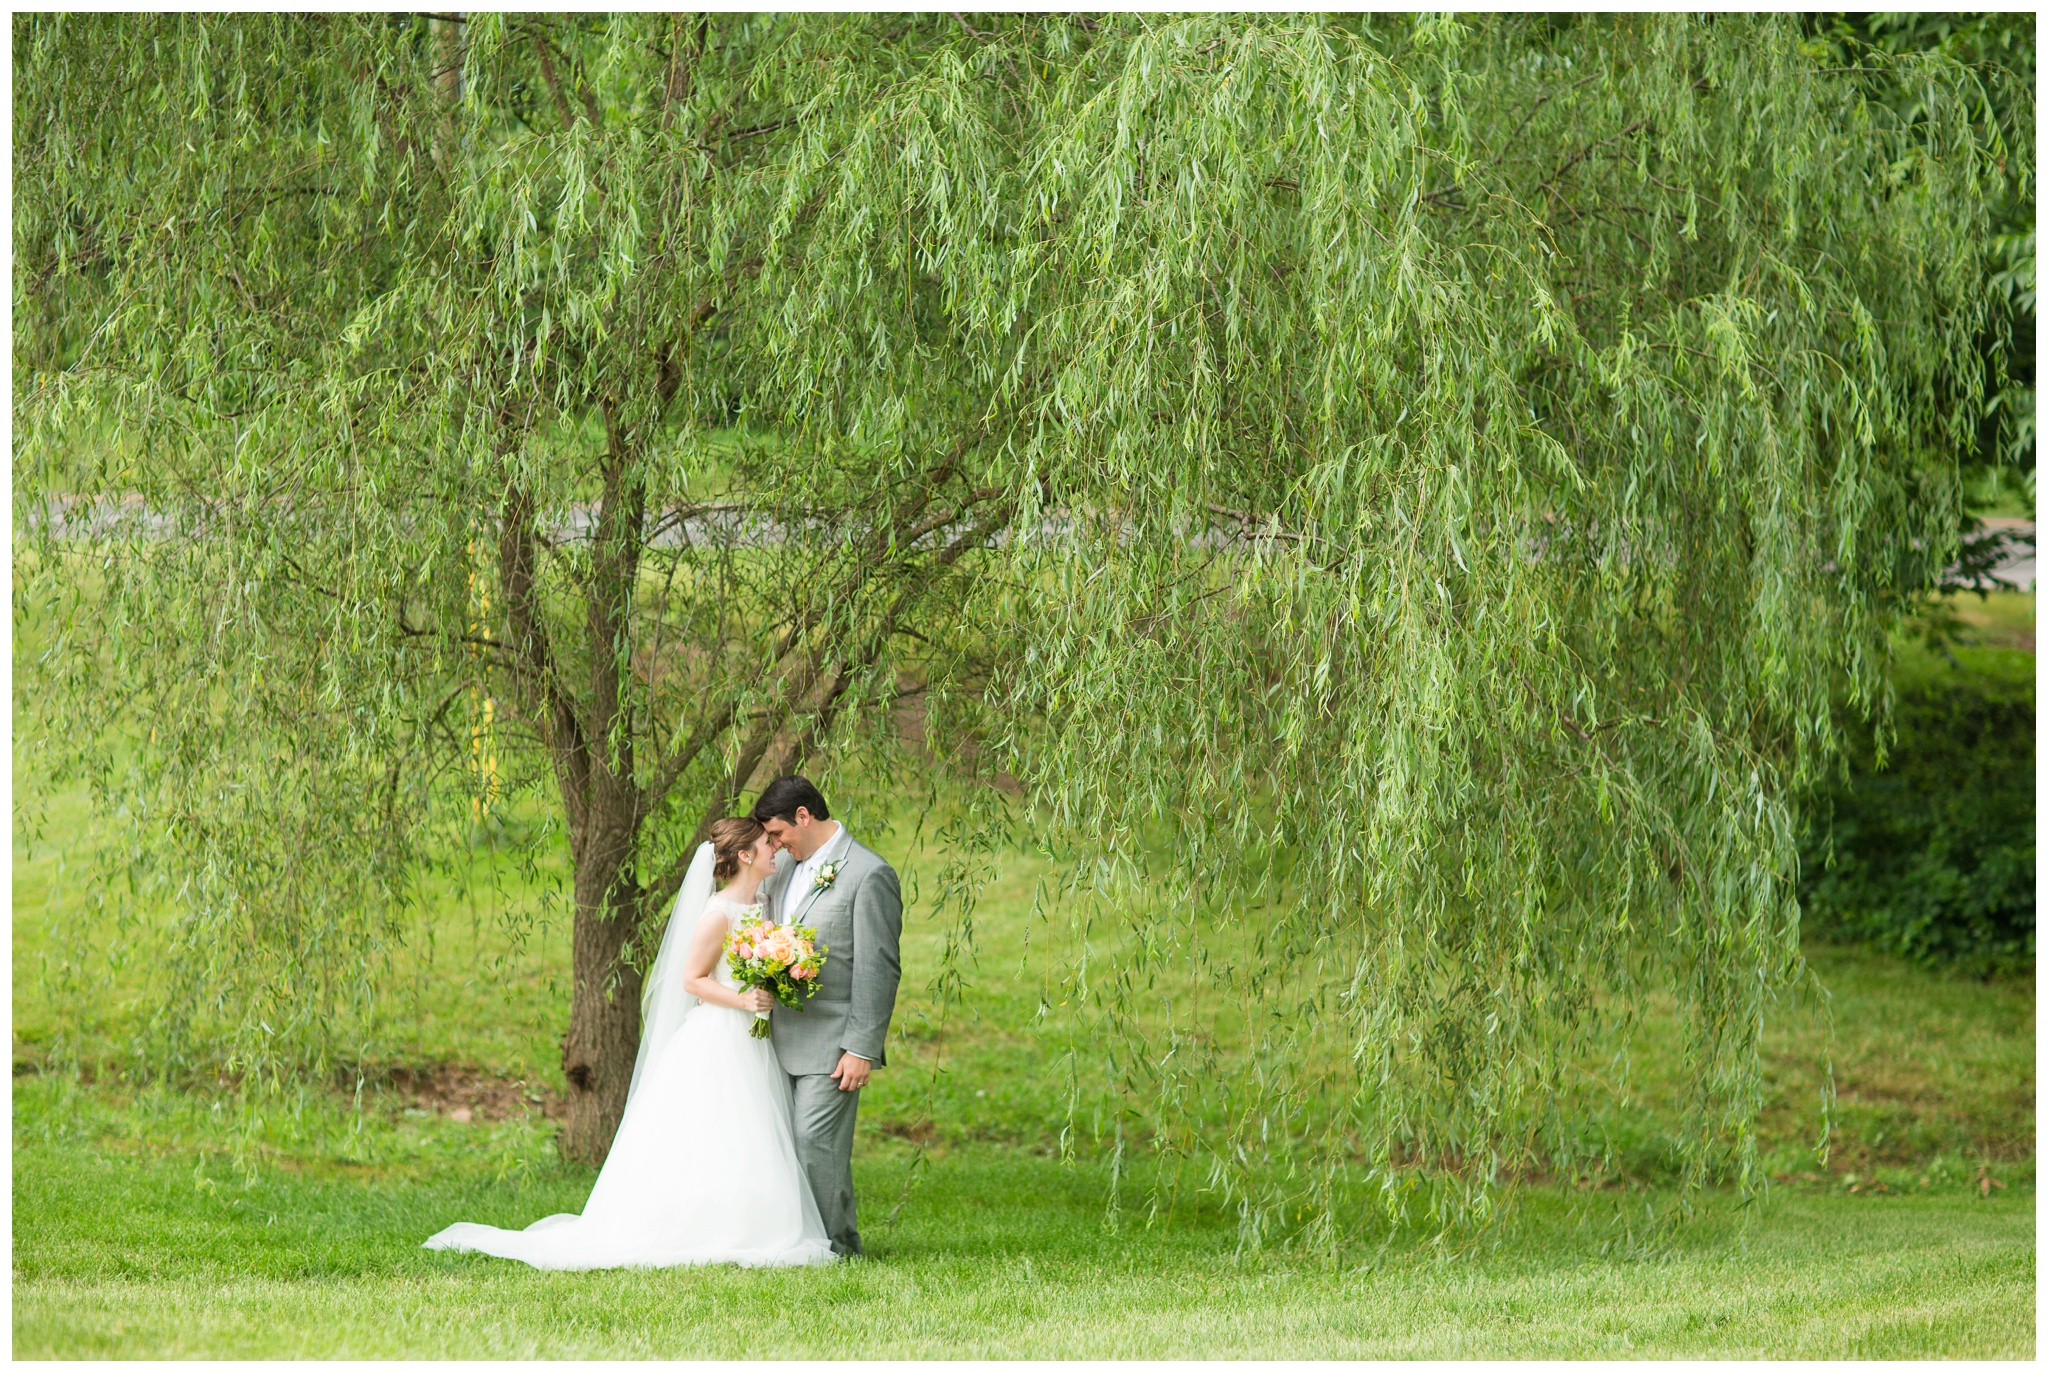 Brian-and-Megan_the-herrintons-va-wedding-photography-153_STOMPED.jpg